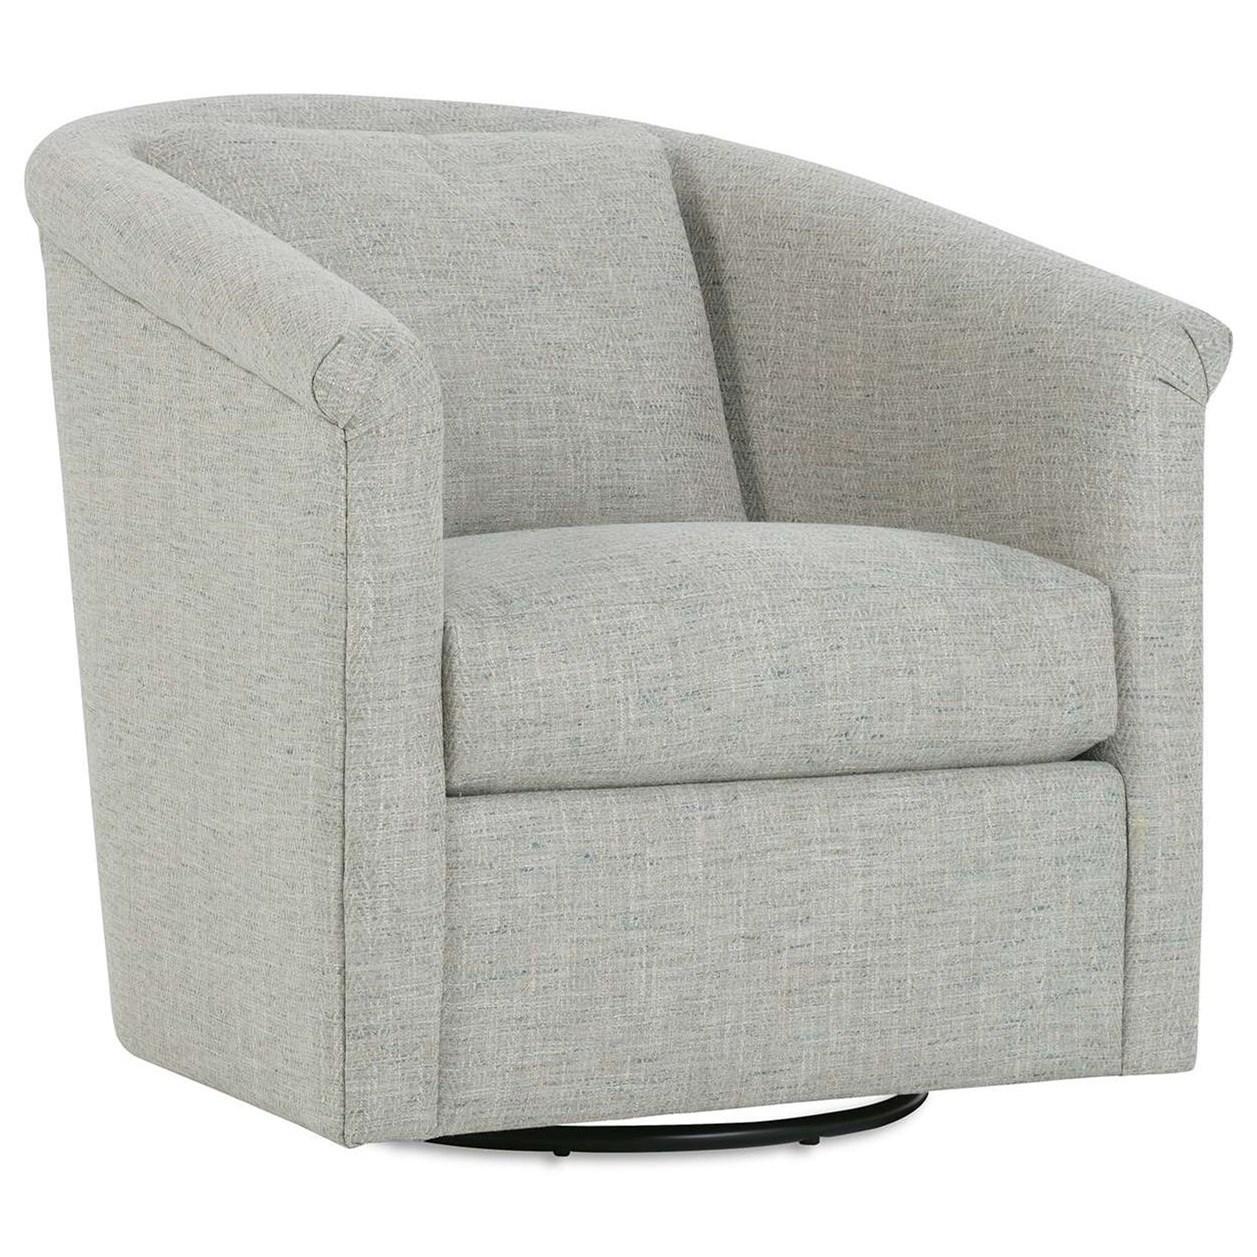 Wrenn Swivel Chair  by Rowe at Baer's Furniture